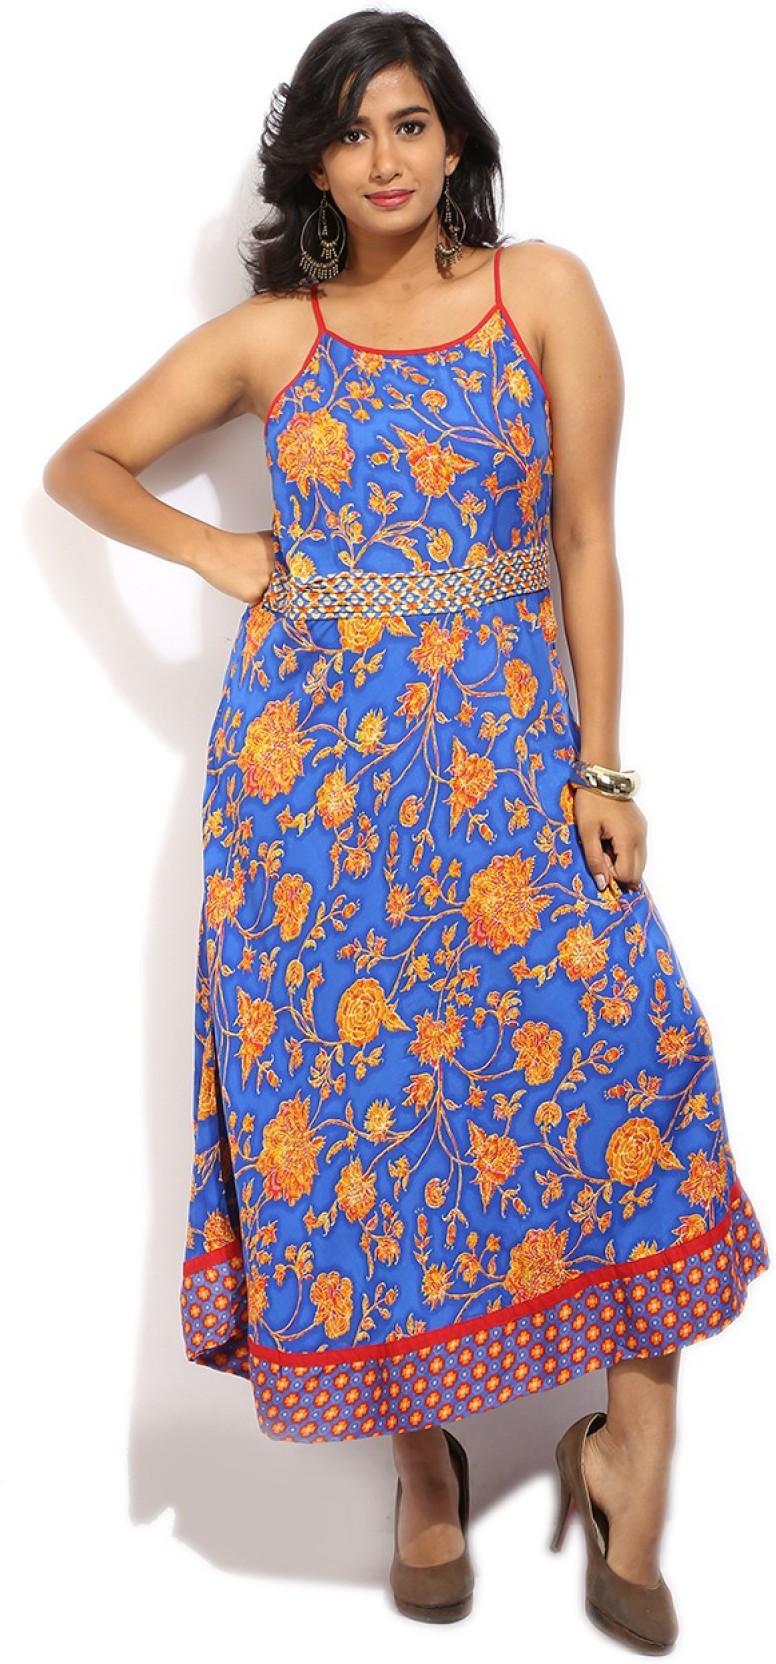 0897cb7a264 Biba Women s Maxi Multicolor Dress - Buy BLUE Biba Women s Maxi ...